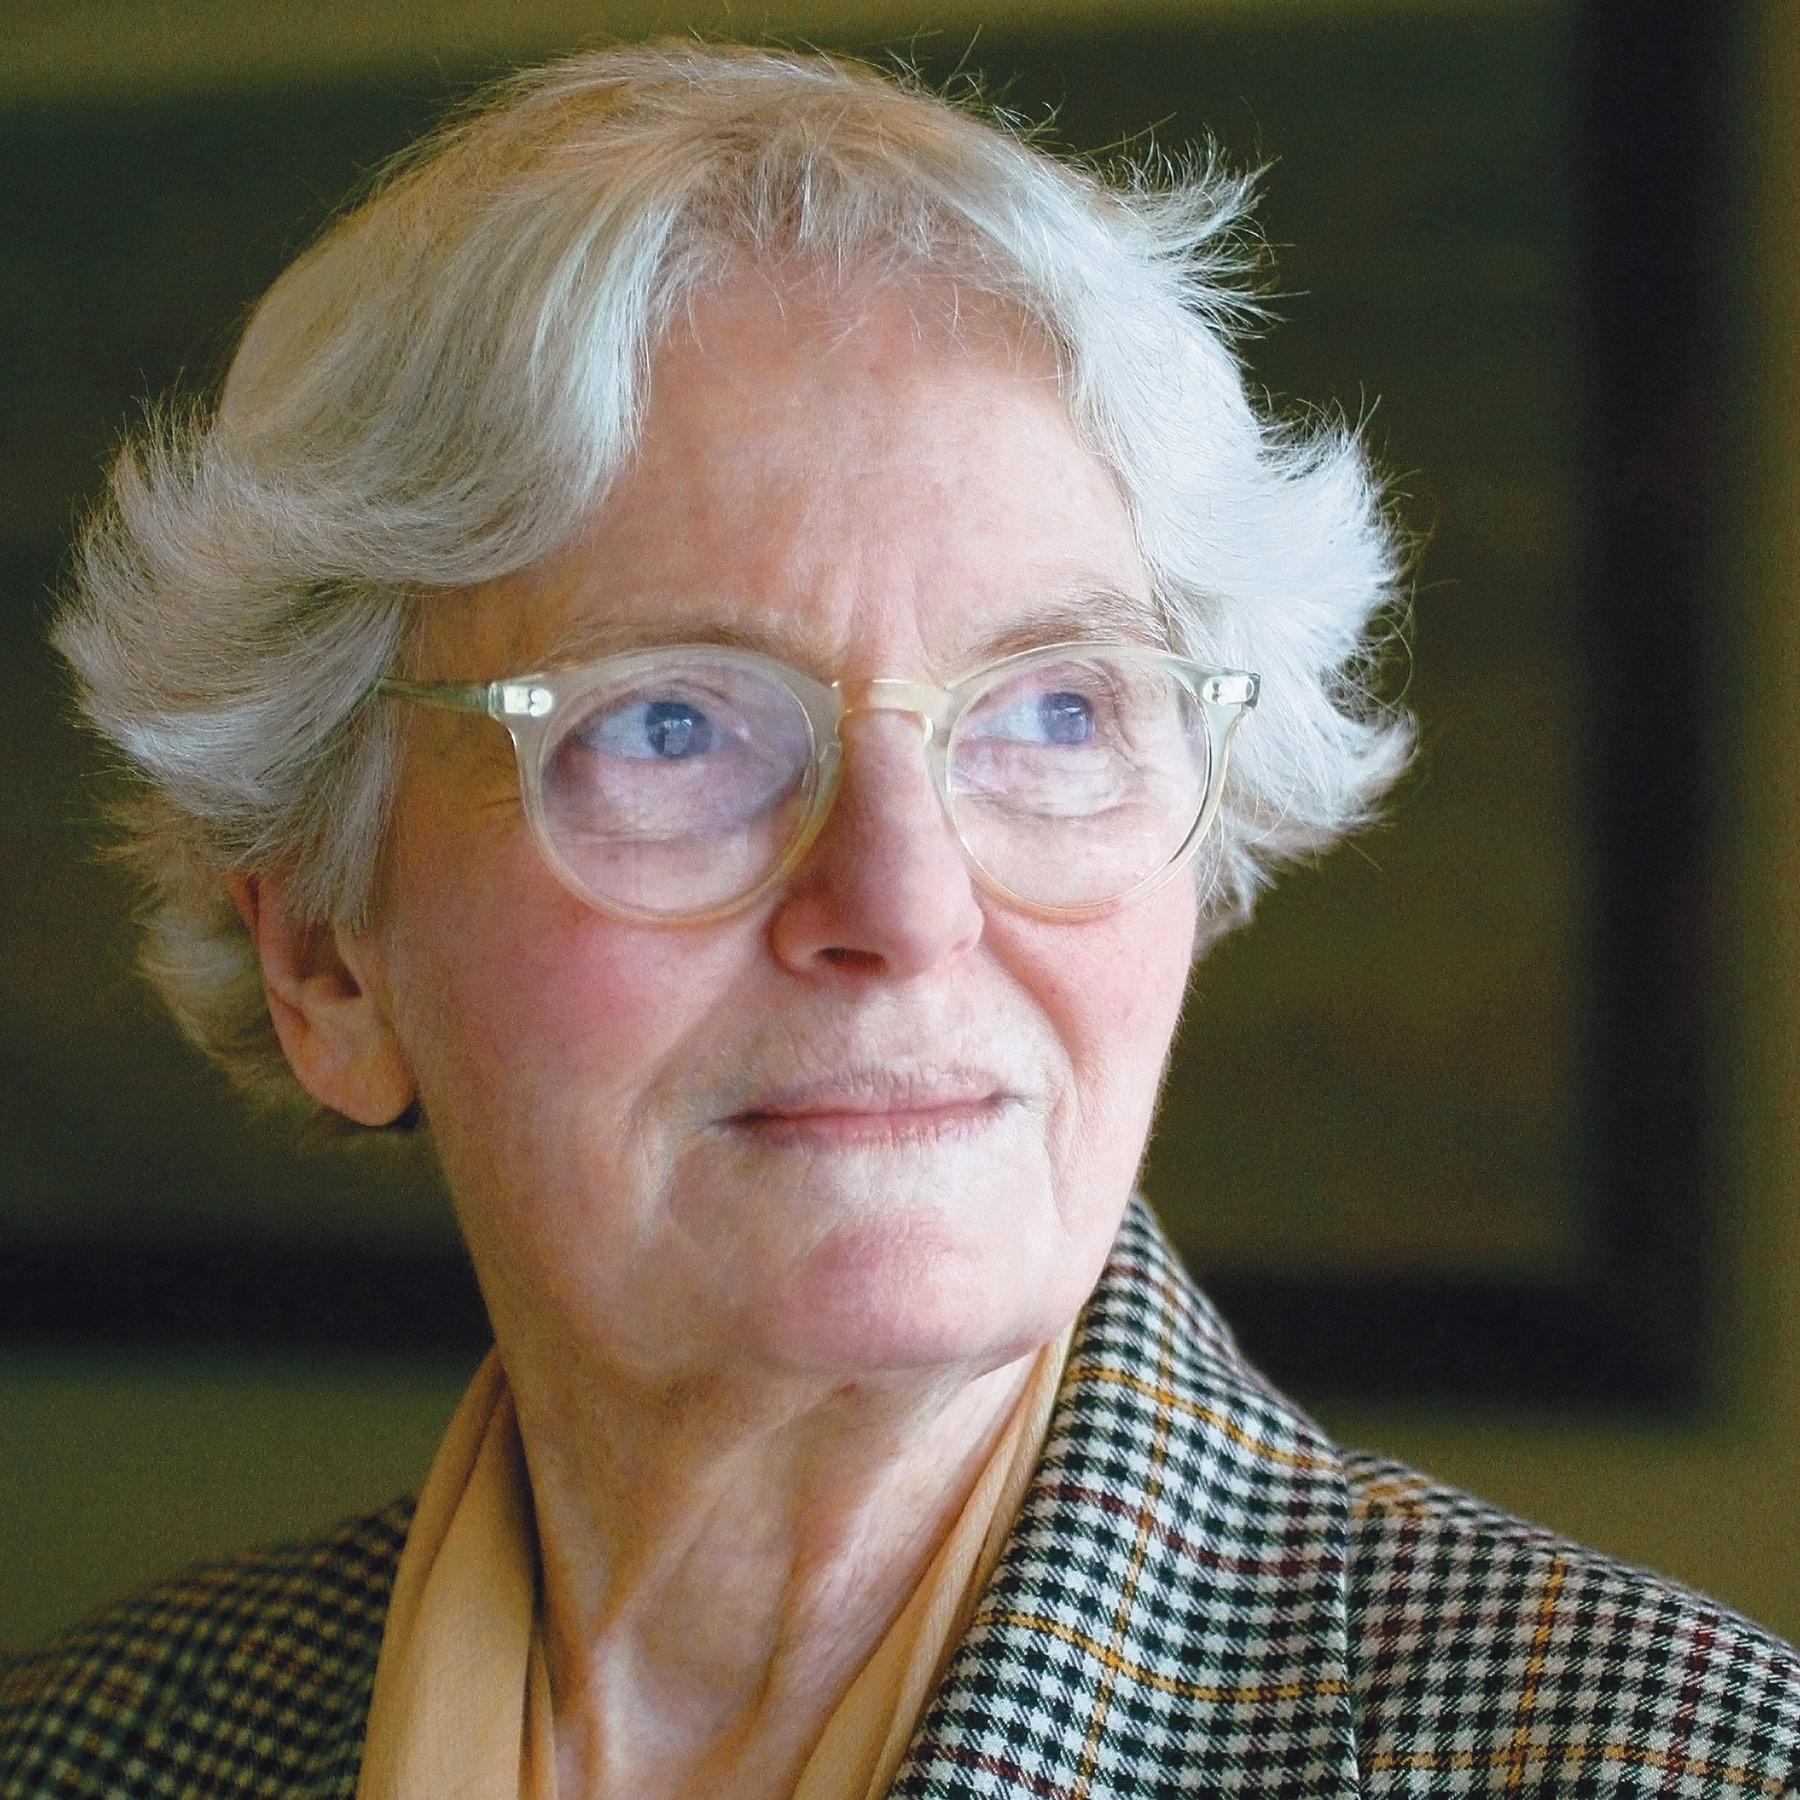 denise scott brown wins jane drew prize for women in architecture